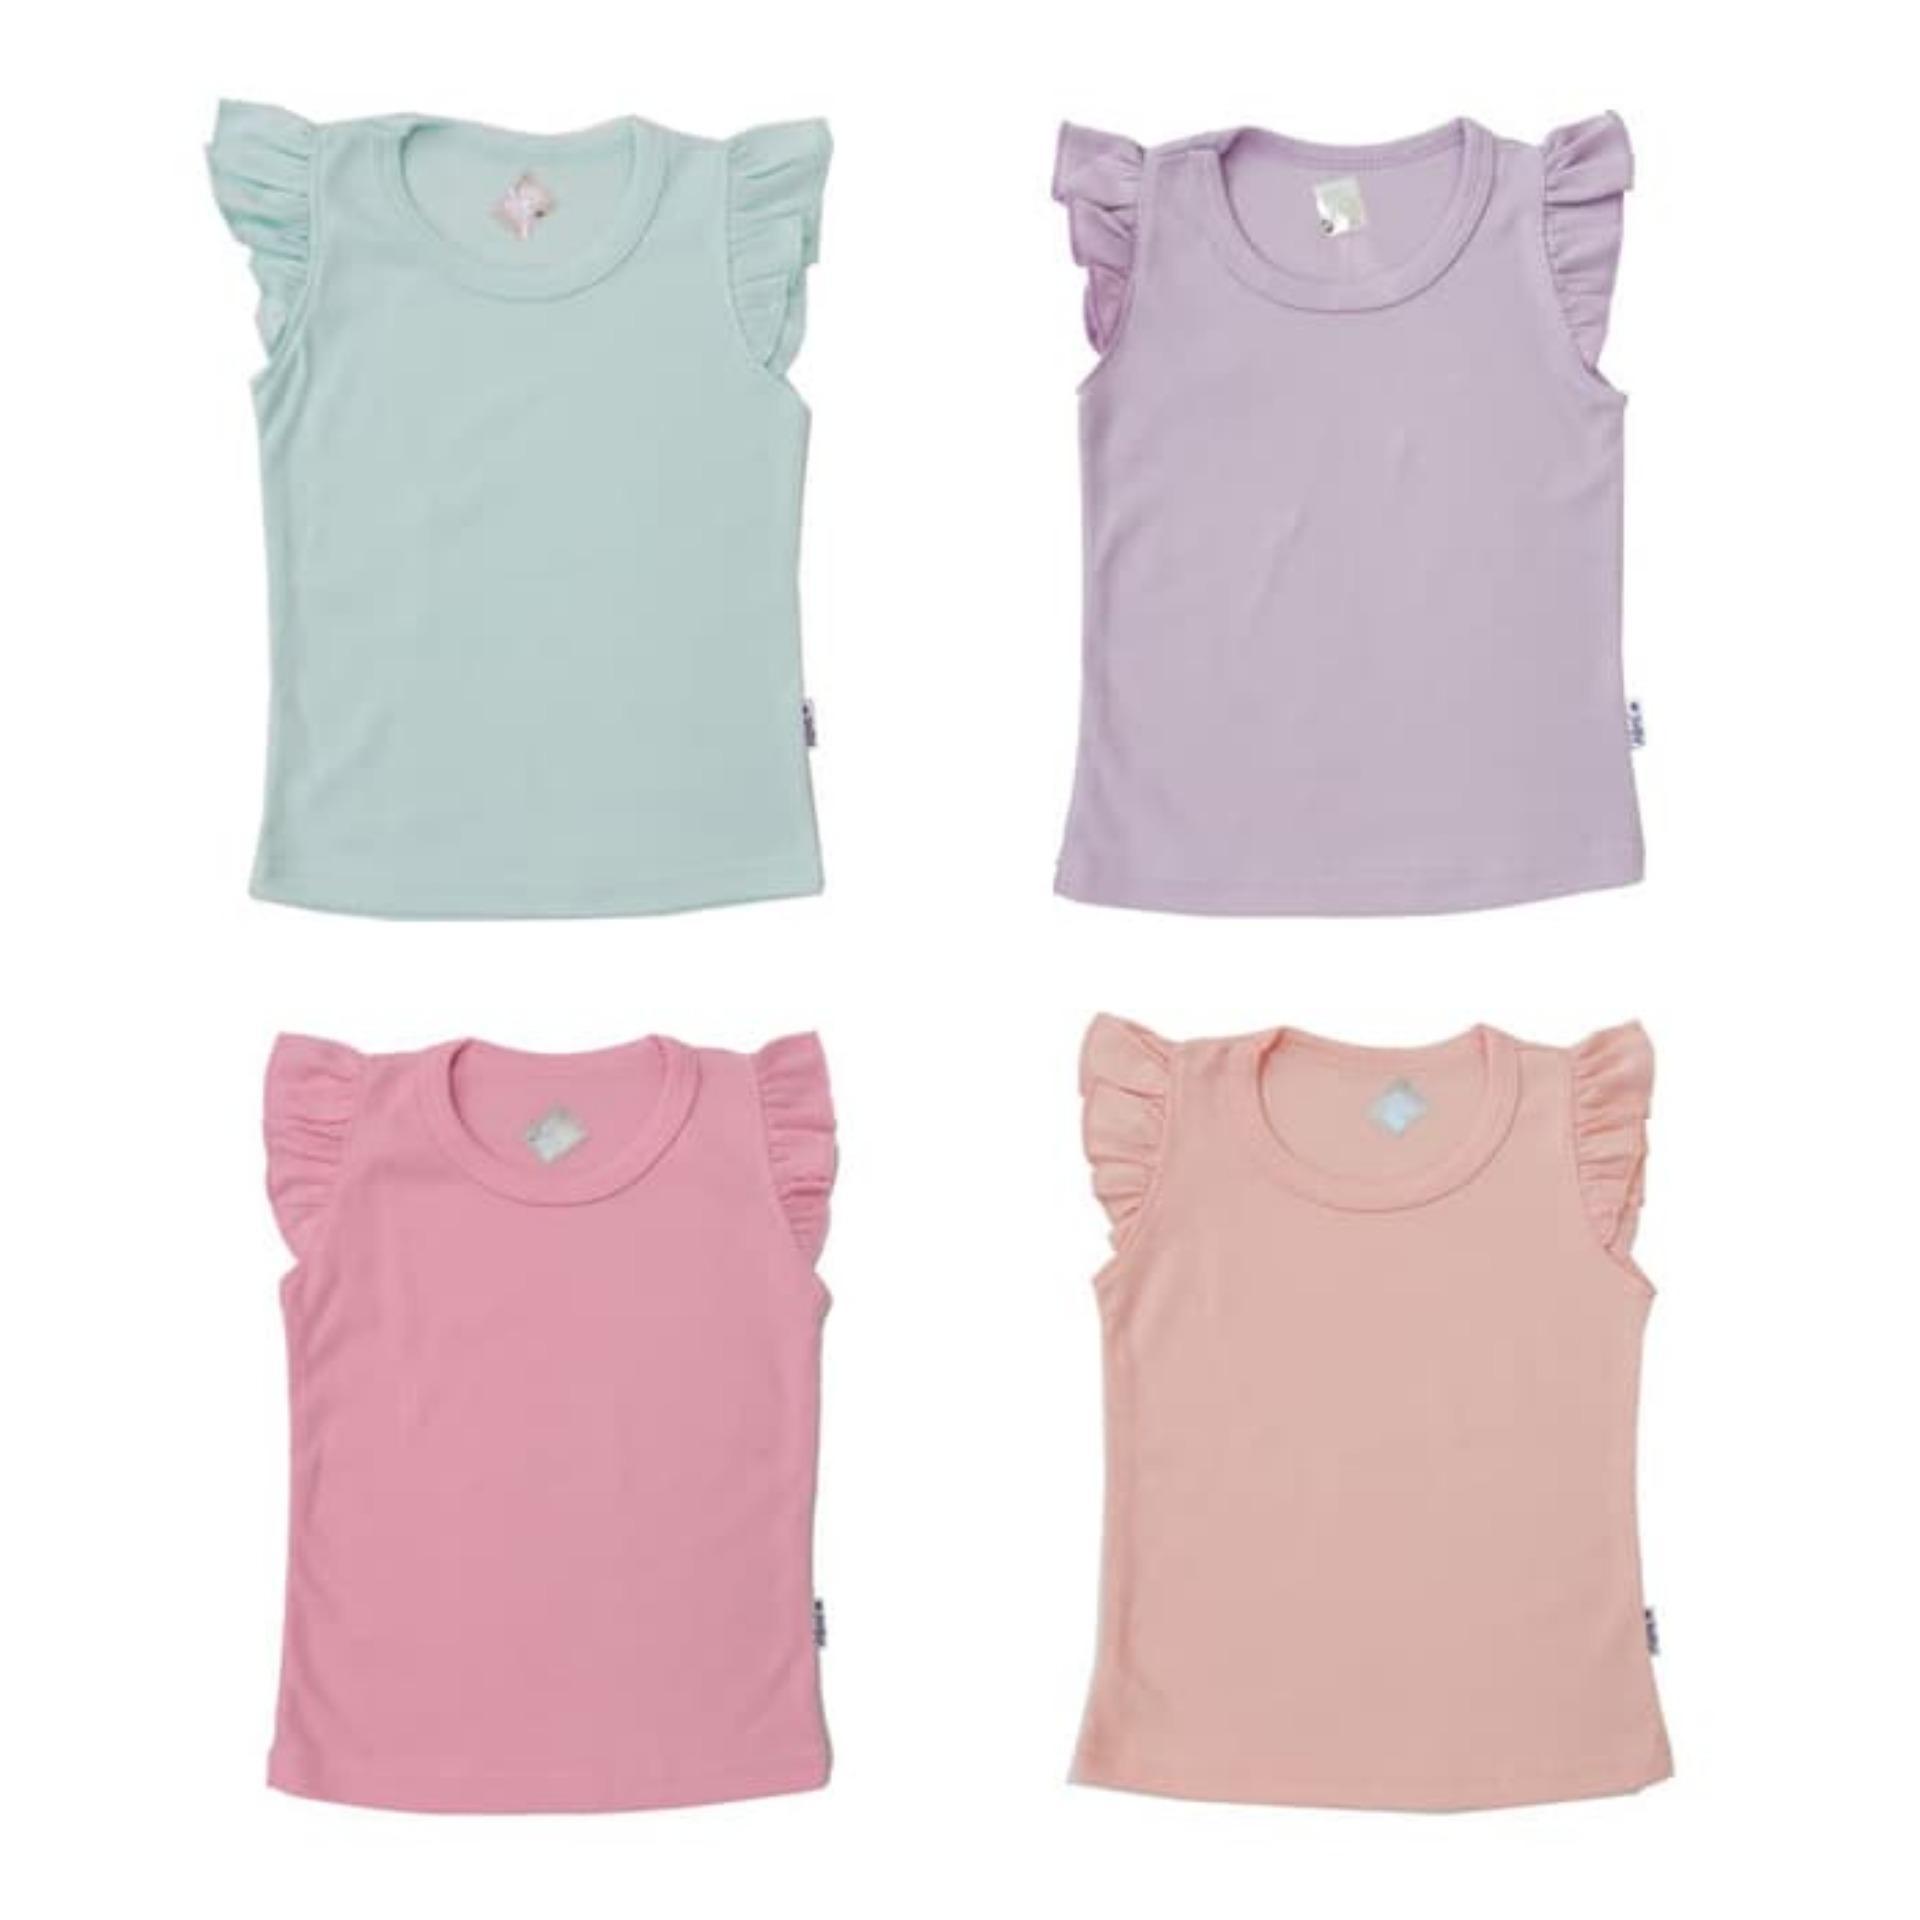 Kazel Tee Shirt Untuk Perempuan - Ruffle Tee Pastel - Isi 4 Pcs - Babyklik By Babyklik.